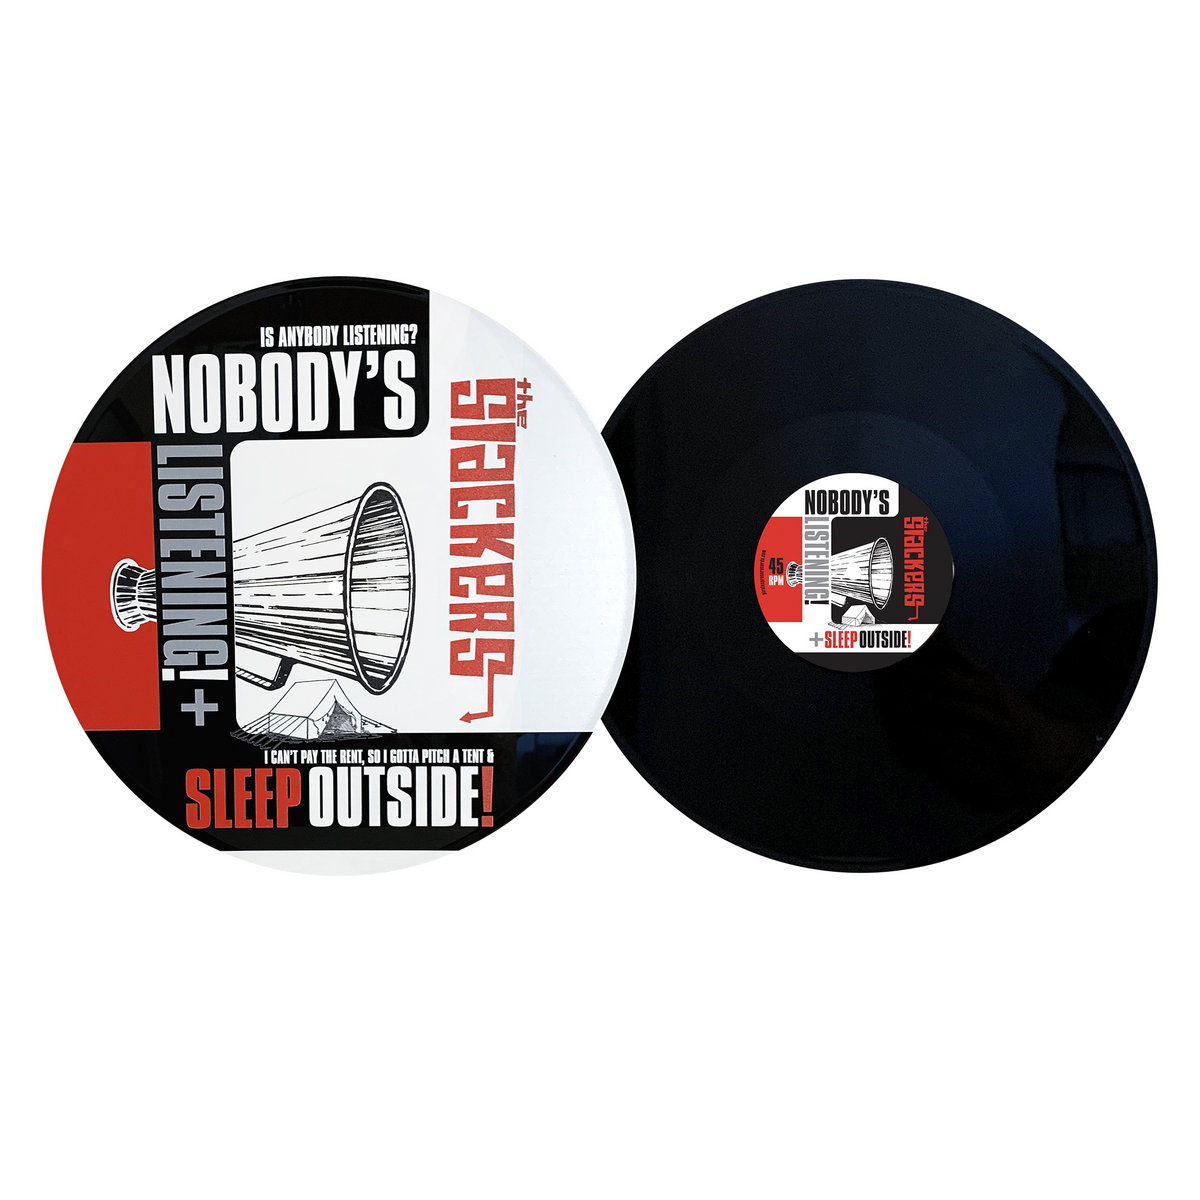 Nobody S Listening Sleep Outside The Slackers Read or print original nobody's listening lyrics 2020 updated! 12 uv digitally printed vinyl